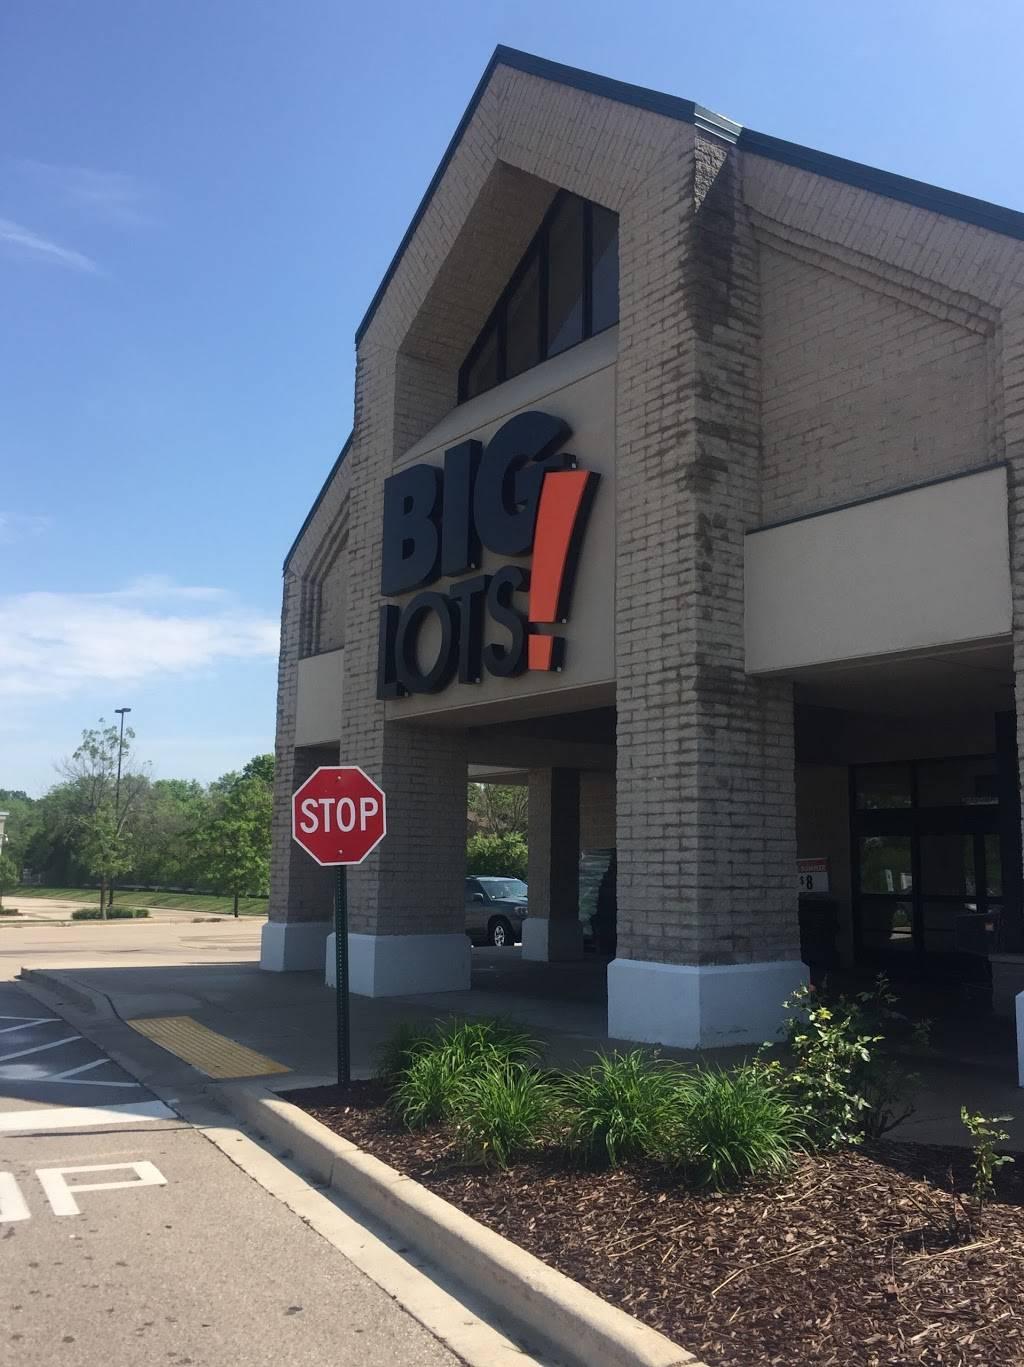 Big Lots - furniture store  | Photo 3 of 7 | Address: N78w14511 Appleton Ave, Menomonee Falls, WI 53051, USA | Phone: (262) 255-4601